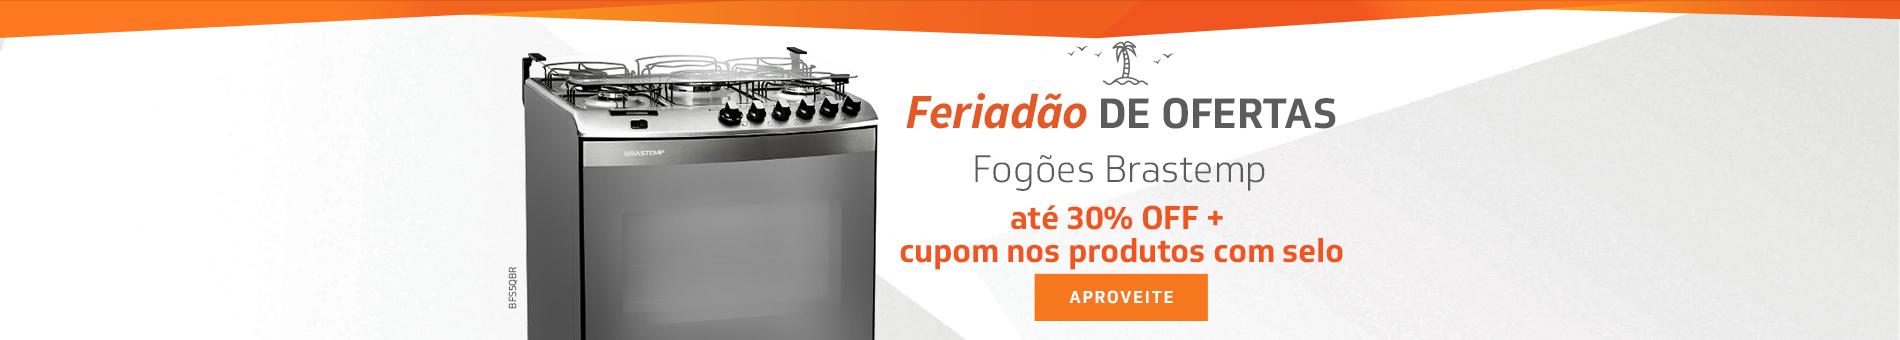 4 - Cupom Fogoes - Sexta